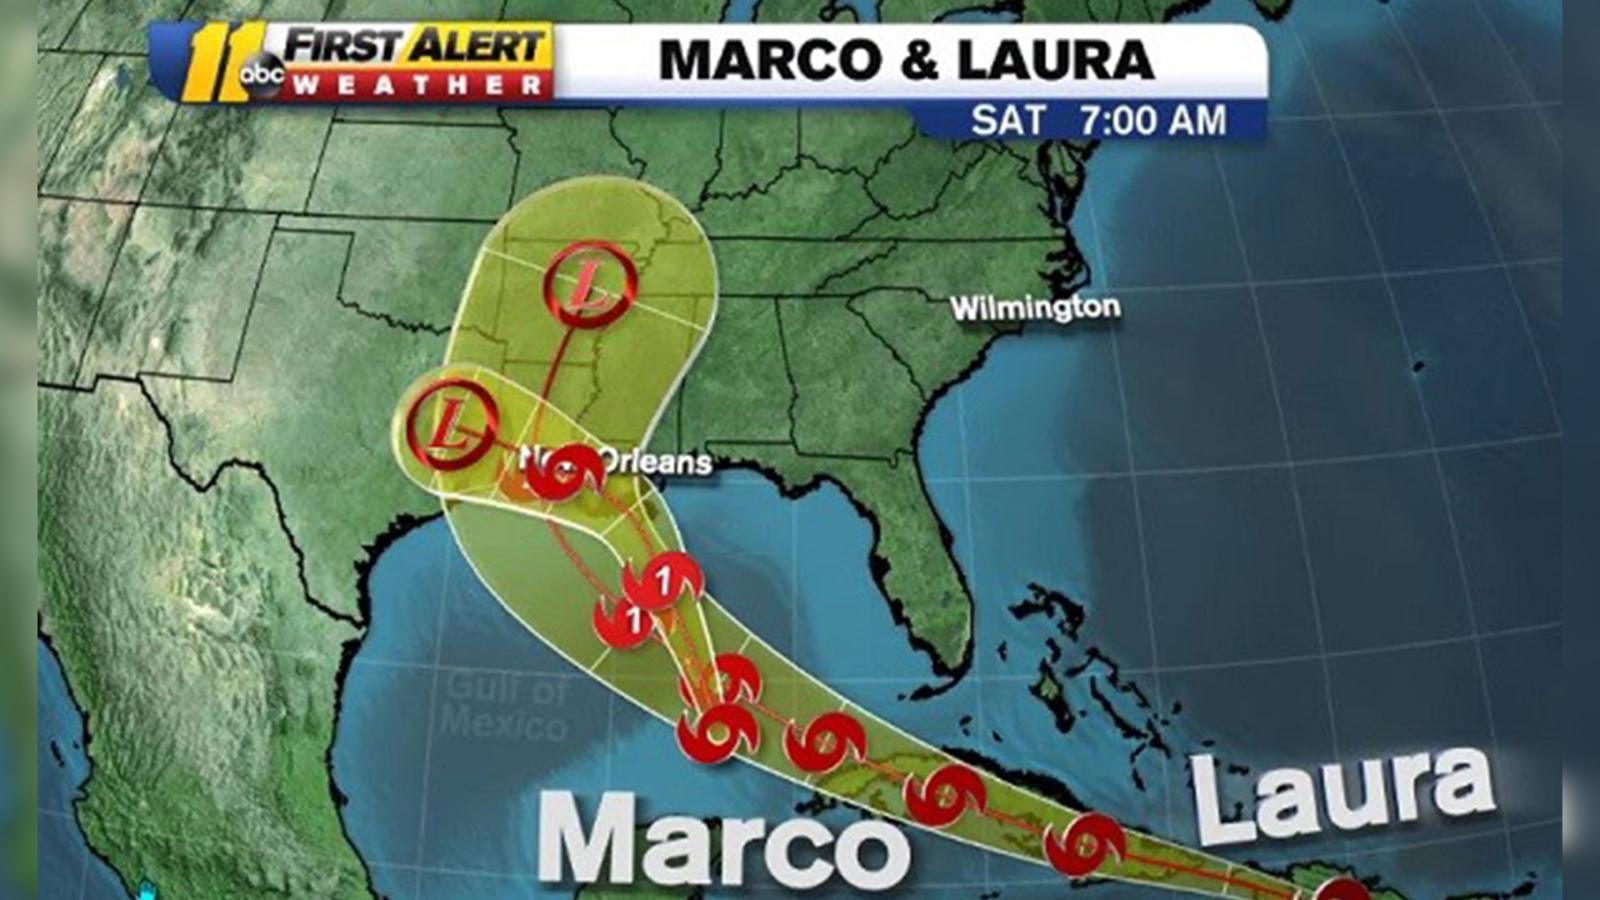 Marco And Laura Update Tropical Storm Marco Tracking Toward Louisiana Coast Tropical Storm Laura To Make Landfall As Category 2 Hurricane National Hurricane Center Says Armenian American Reporter